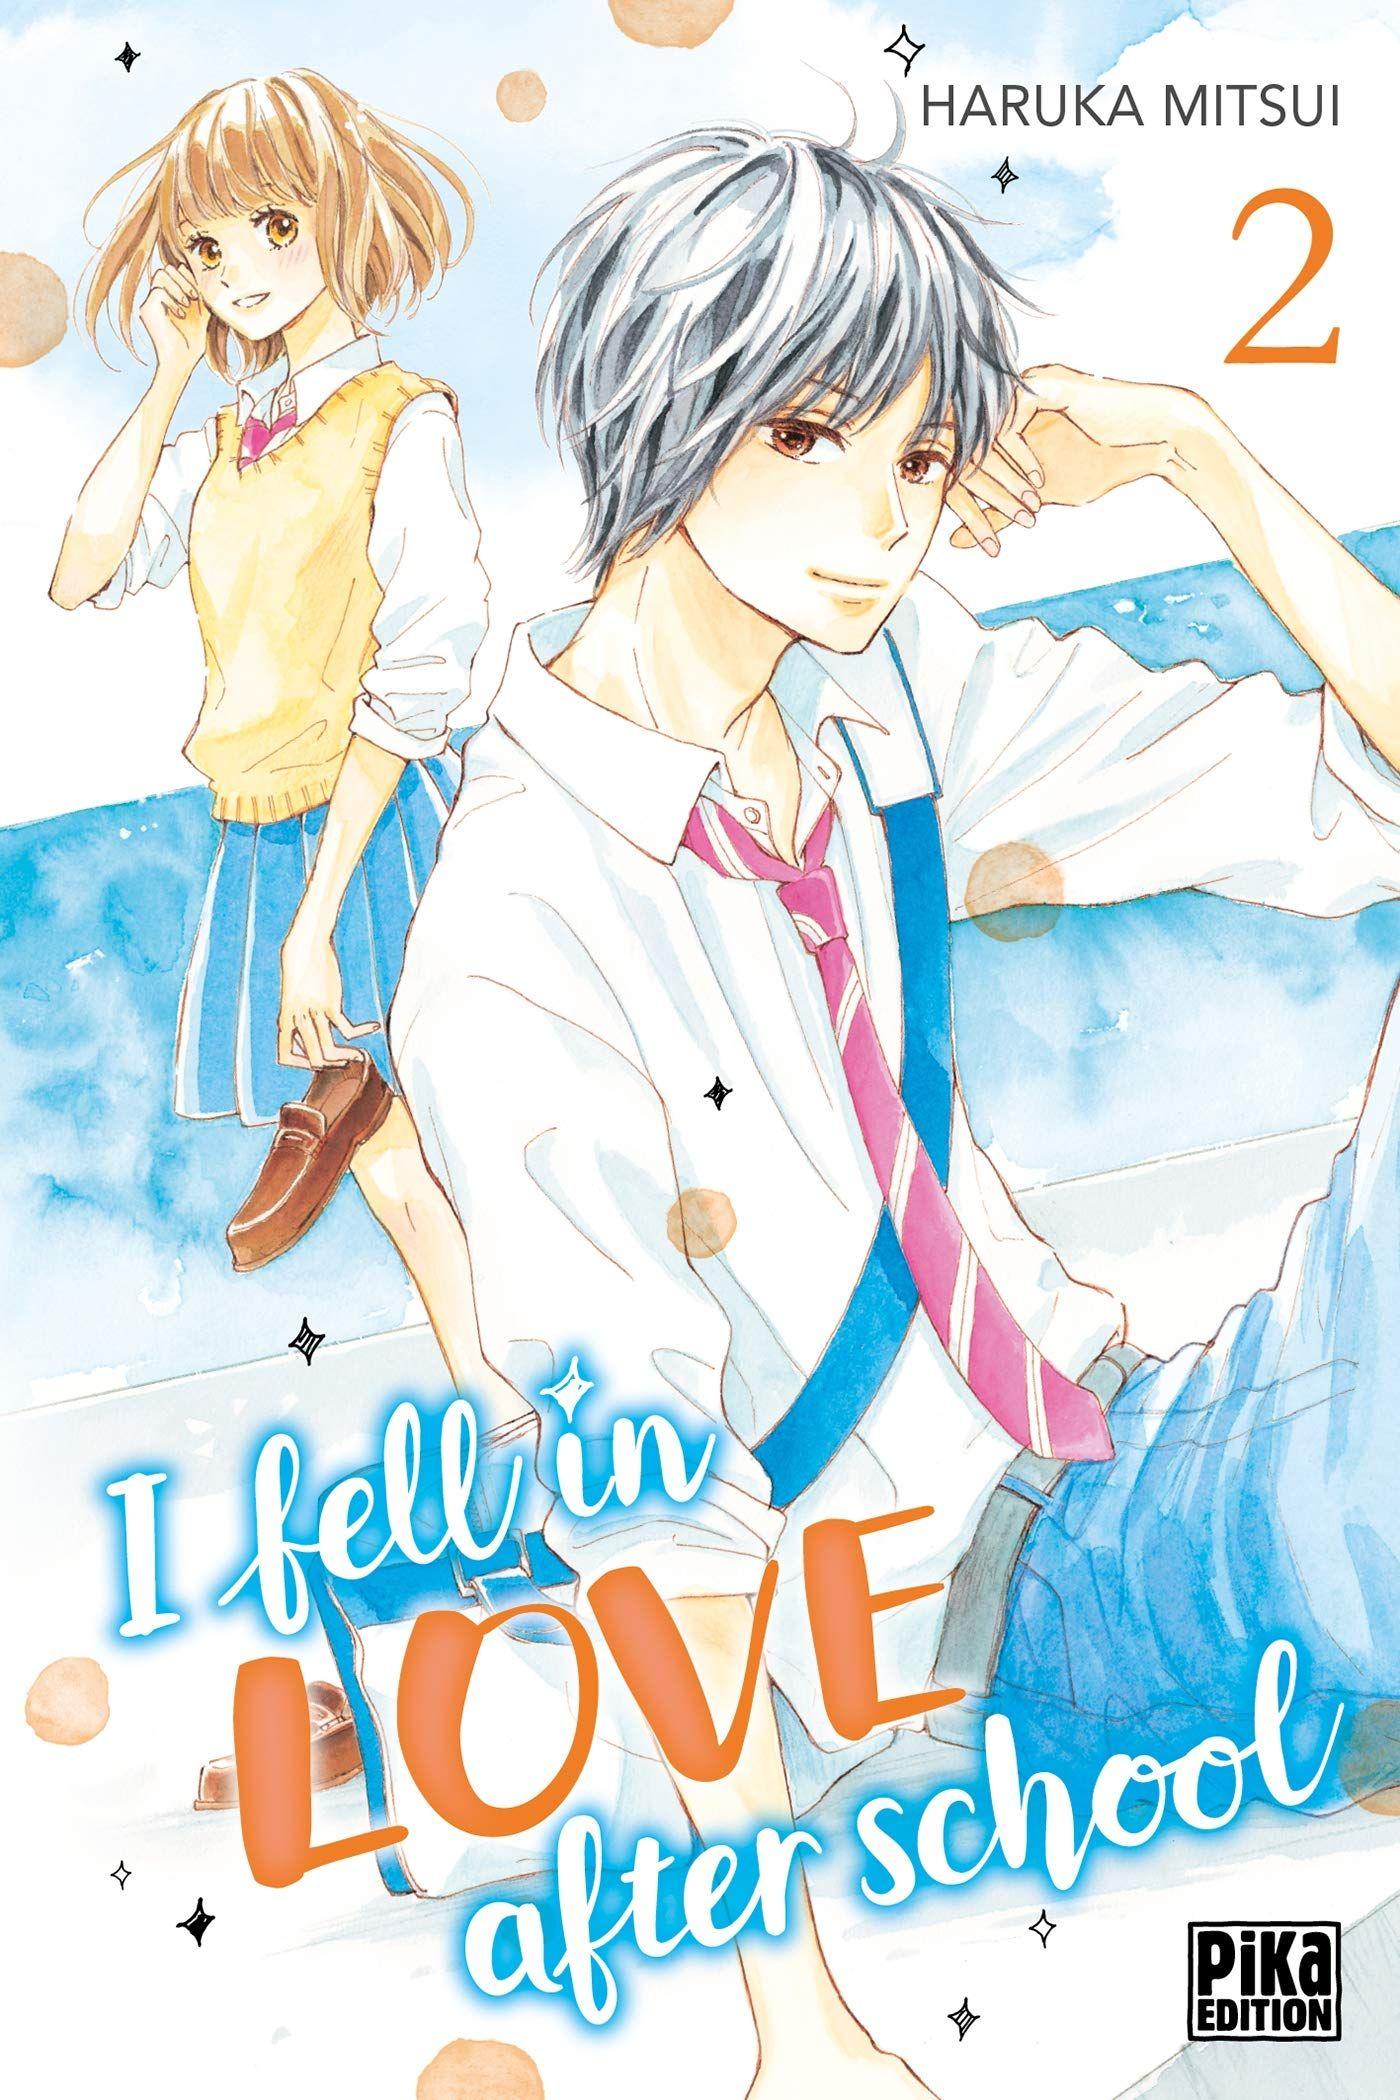 Sortie Manga au Québec JUIN 2021 I-feel-love-after-school-2-pika